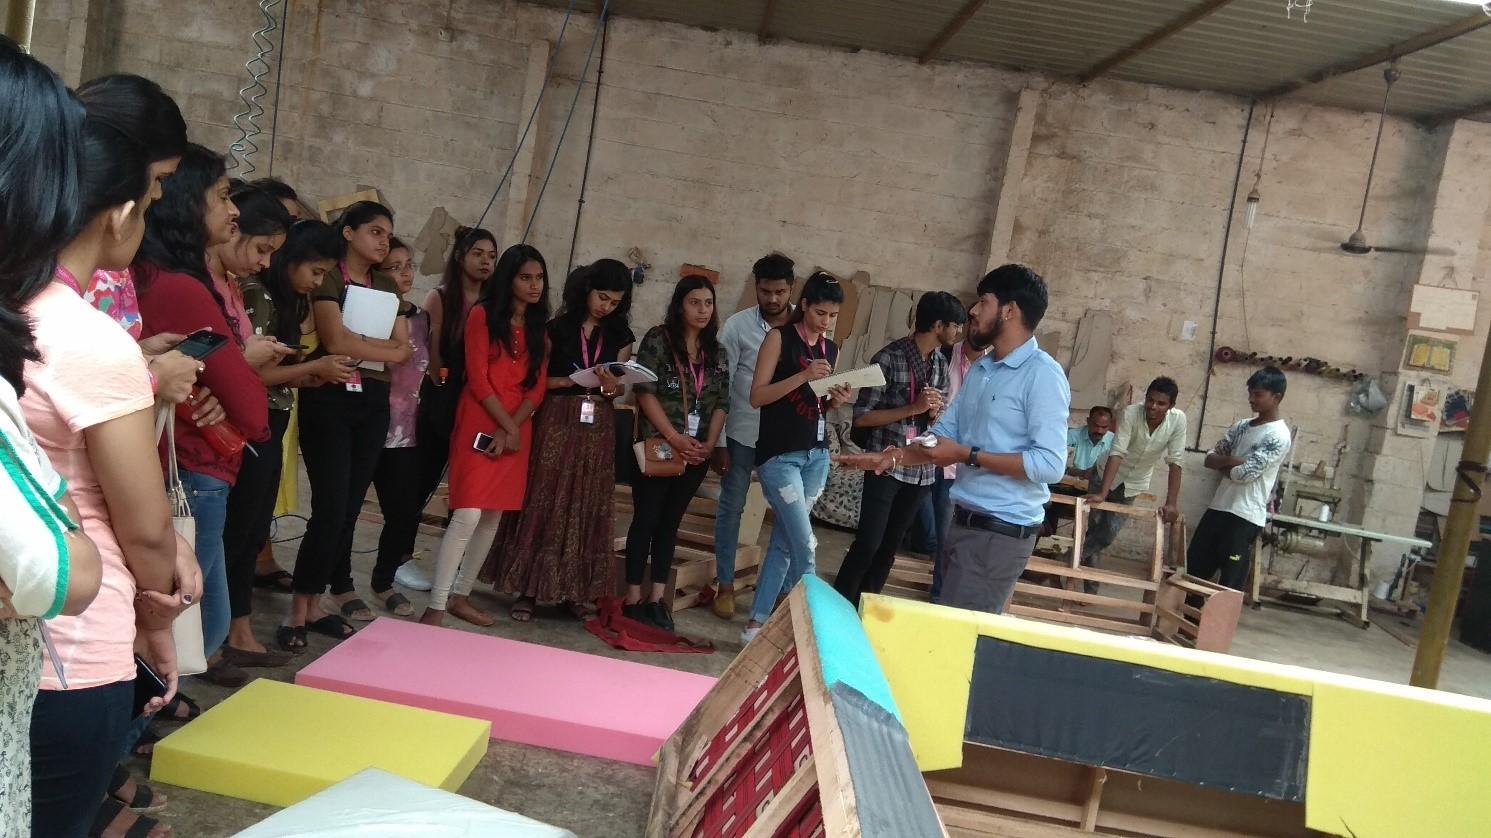 industrial visit for the interior design course students - Sofa factory Visit4 - Industrial Visit for the Interior Design Course Students